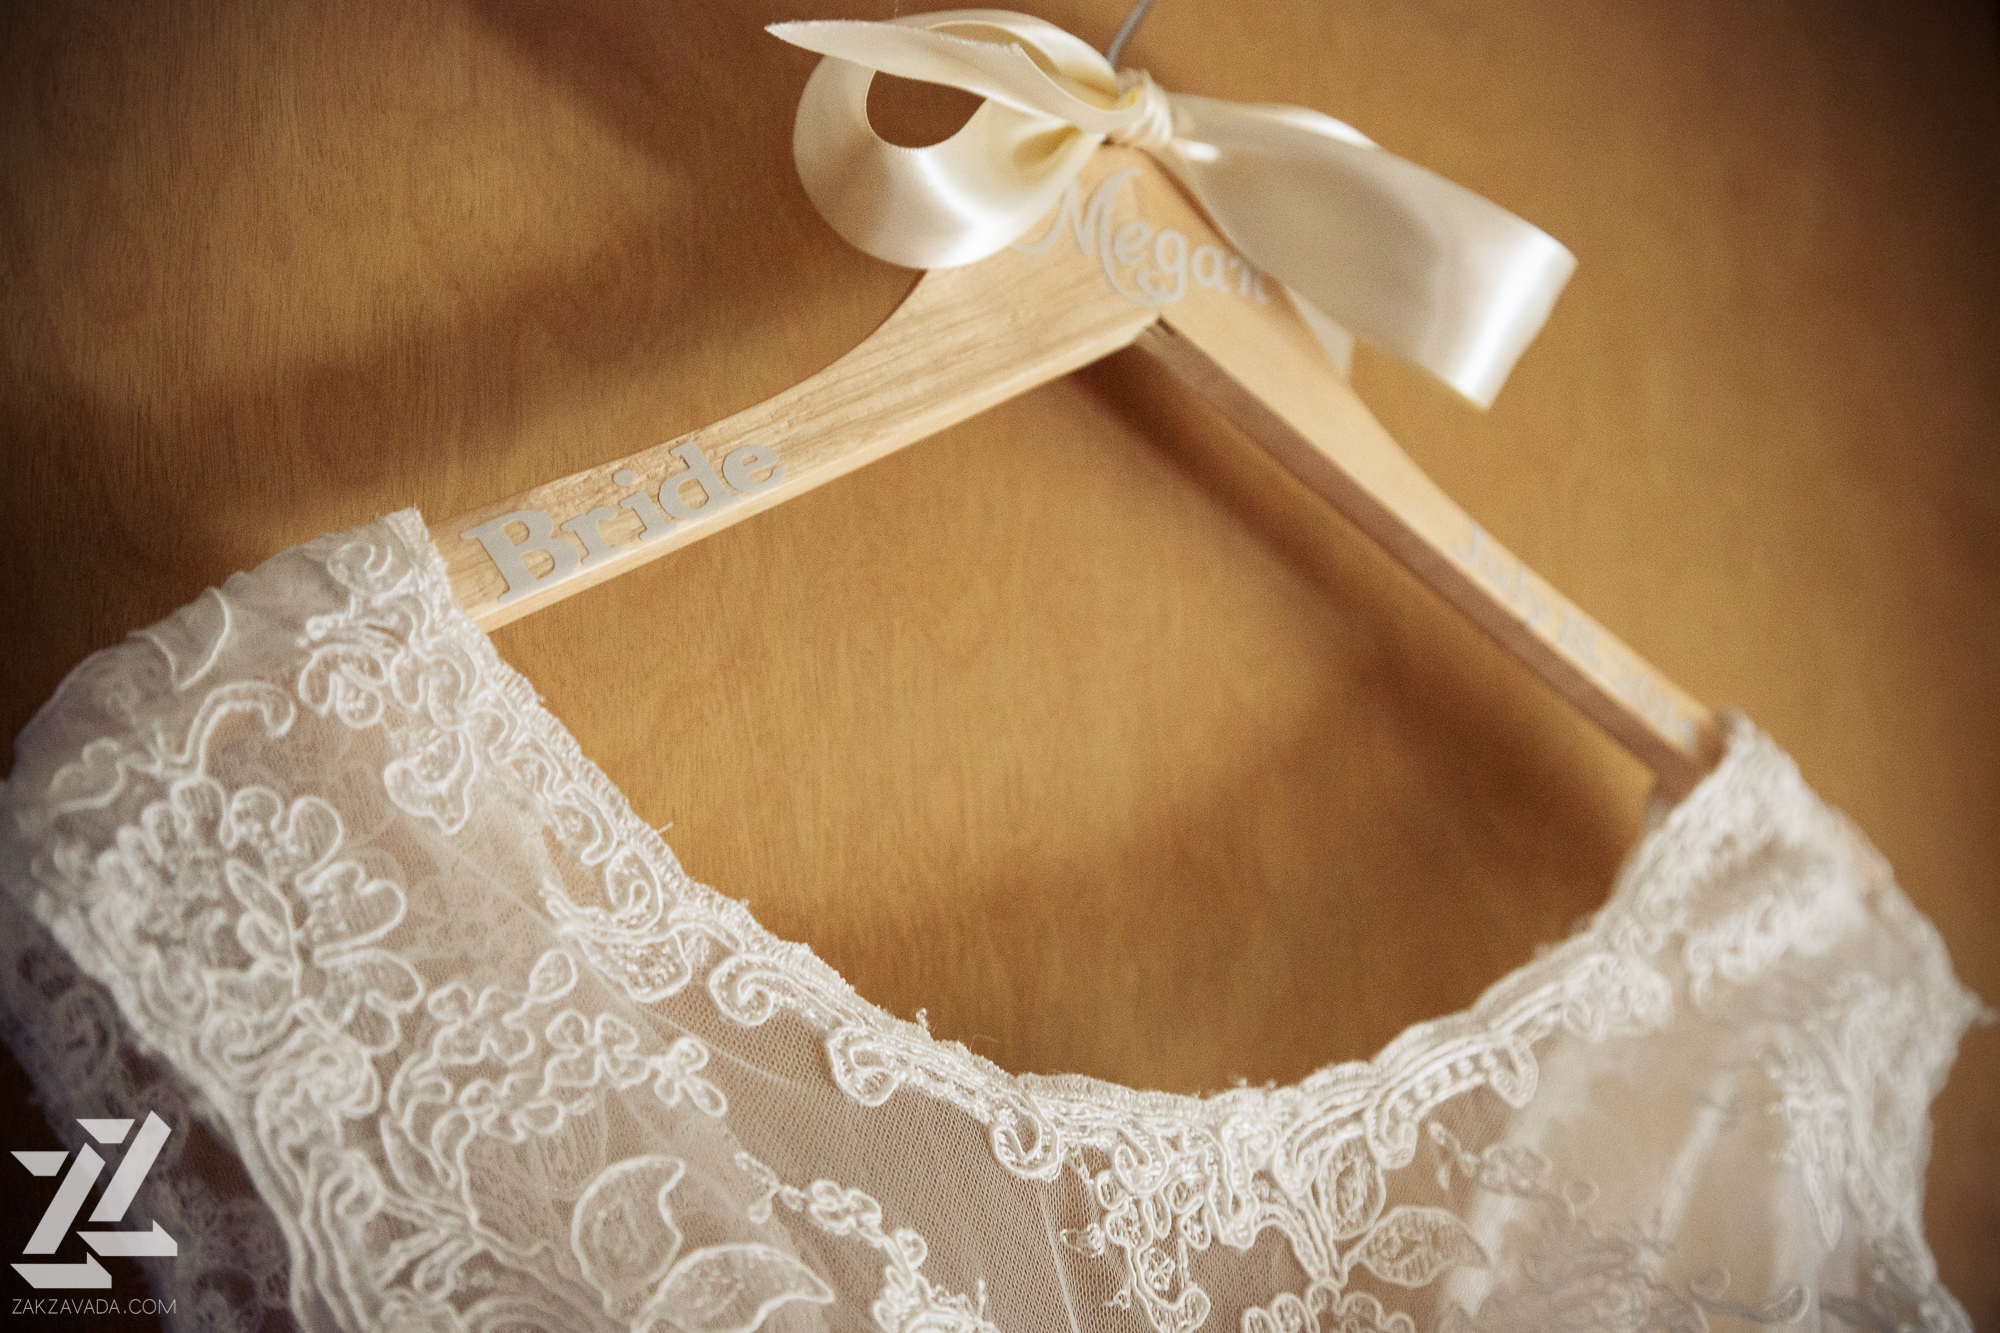 scranton-wedding-photography-zak-zavada-meganJonathan-018.jpg